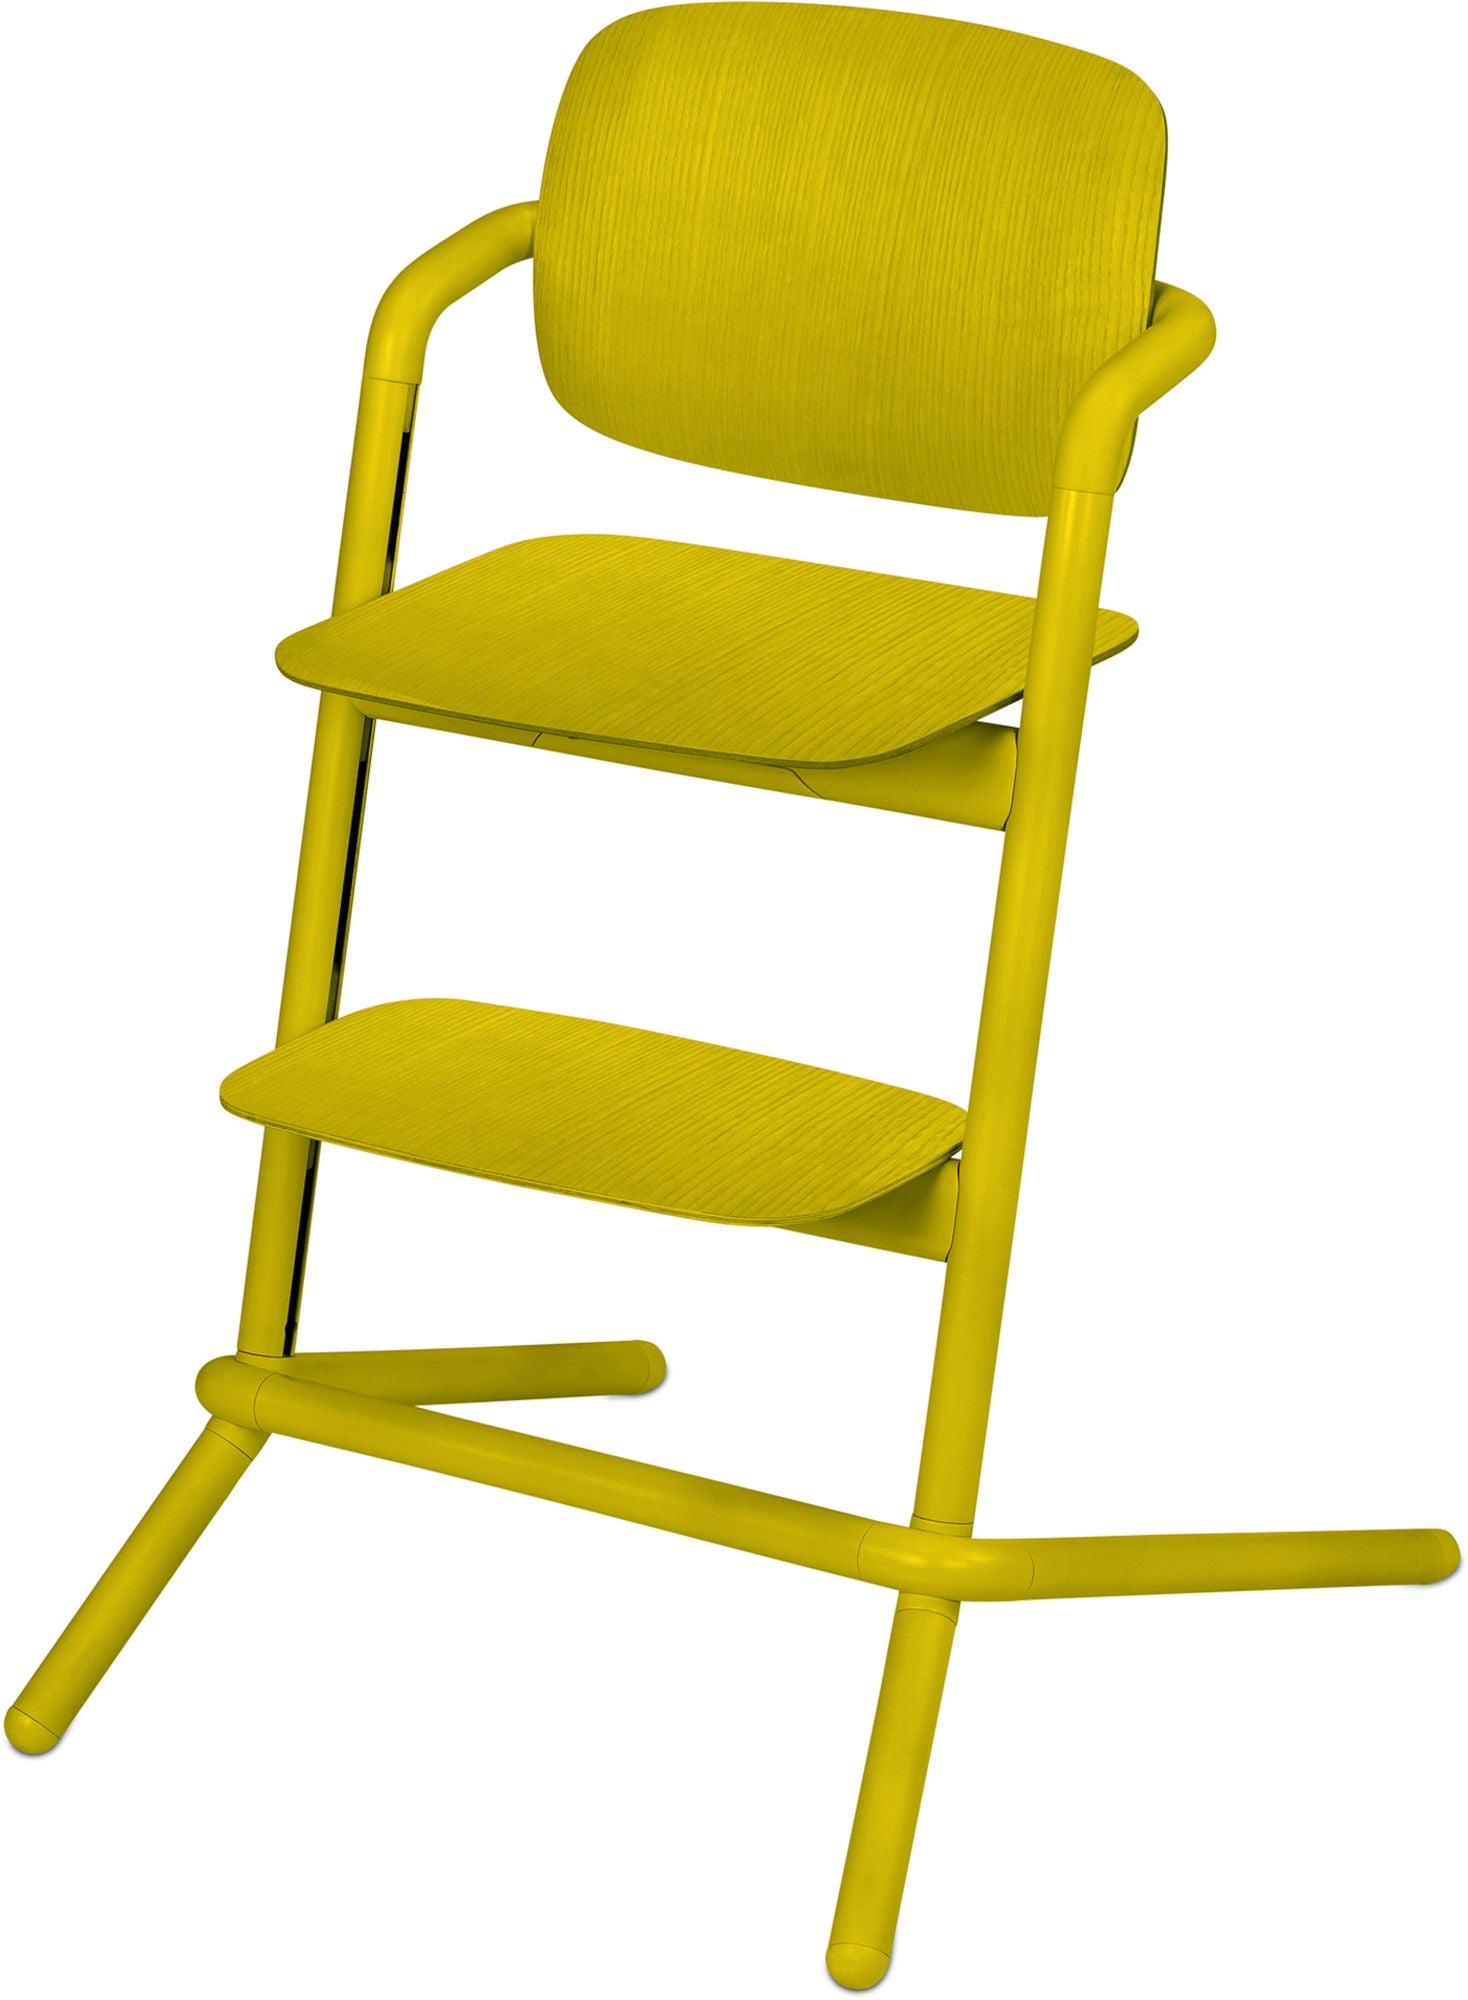 Cybex Lemo Matstol Trä, Canary Yellow